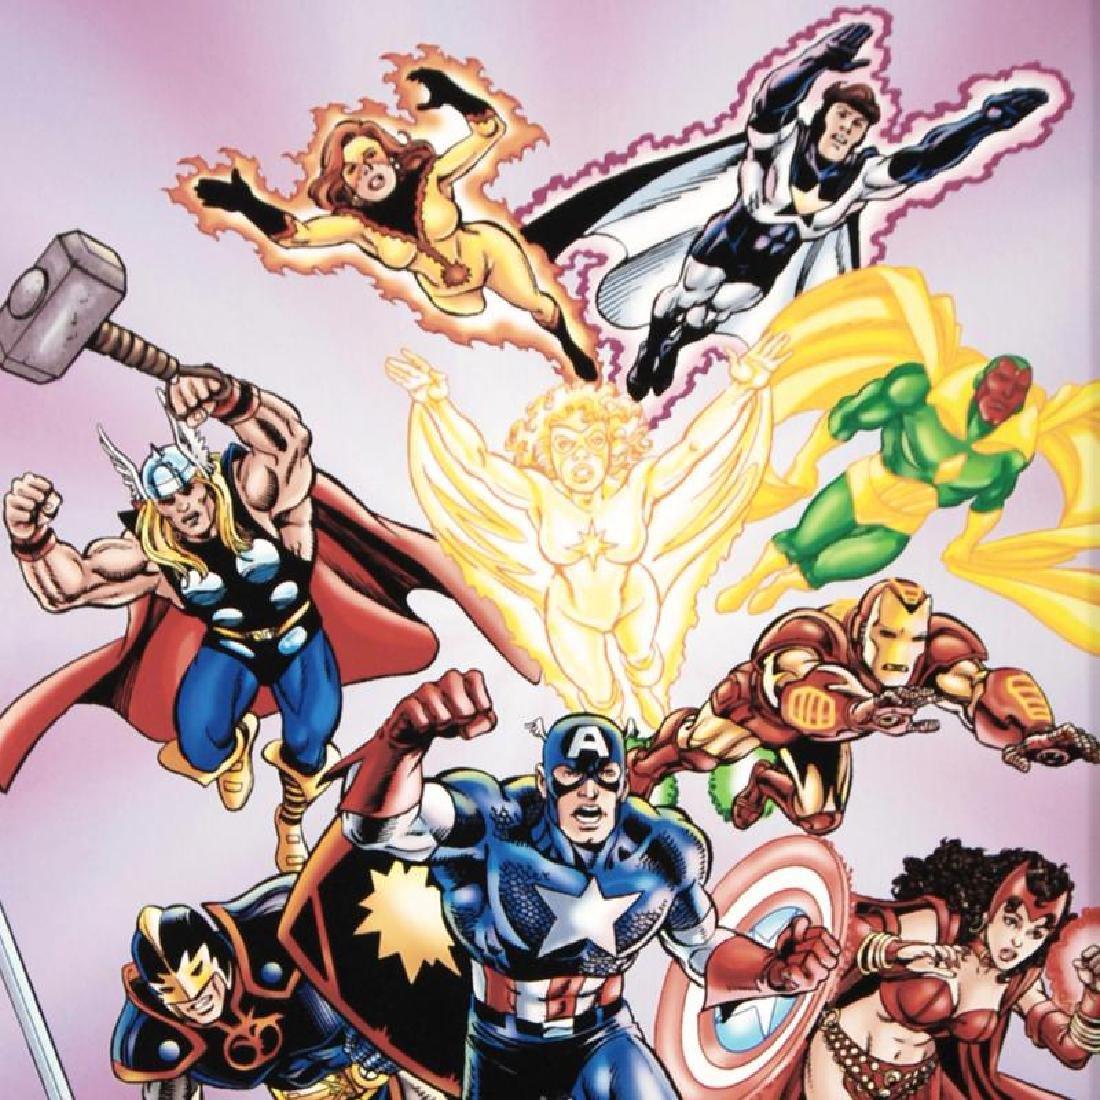 Avengers #16 by Stan Lee - Marvel Comics - 2